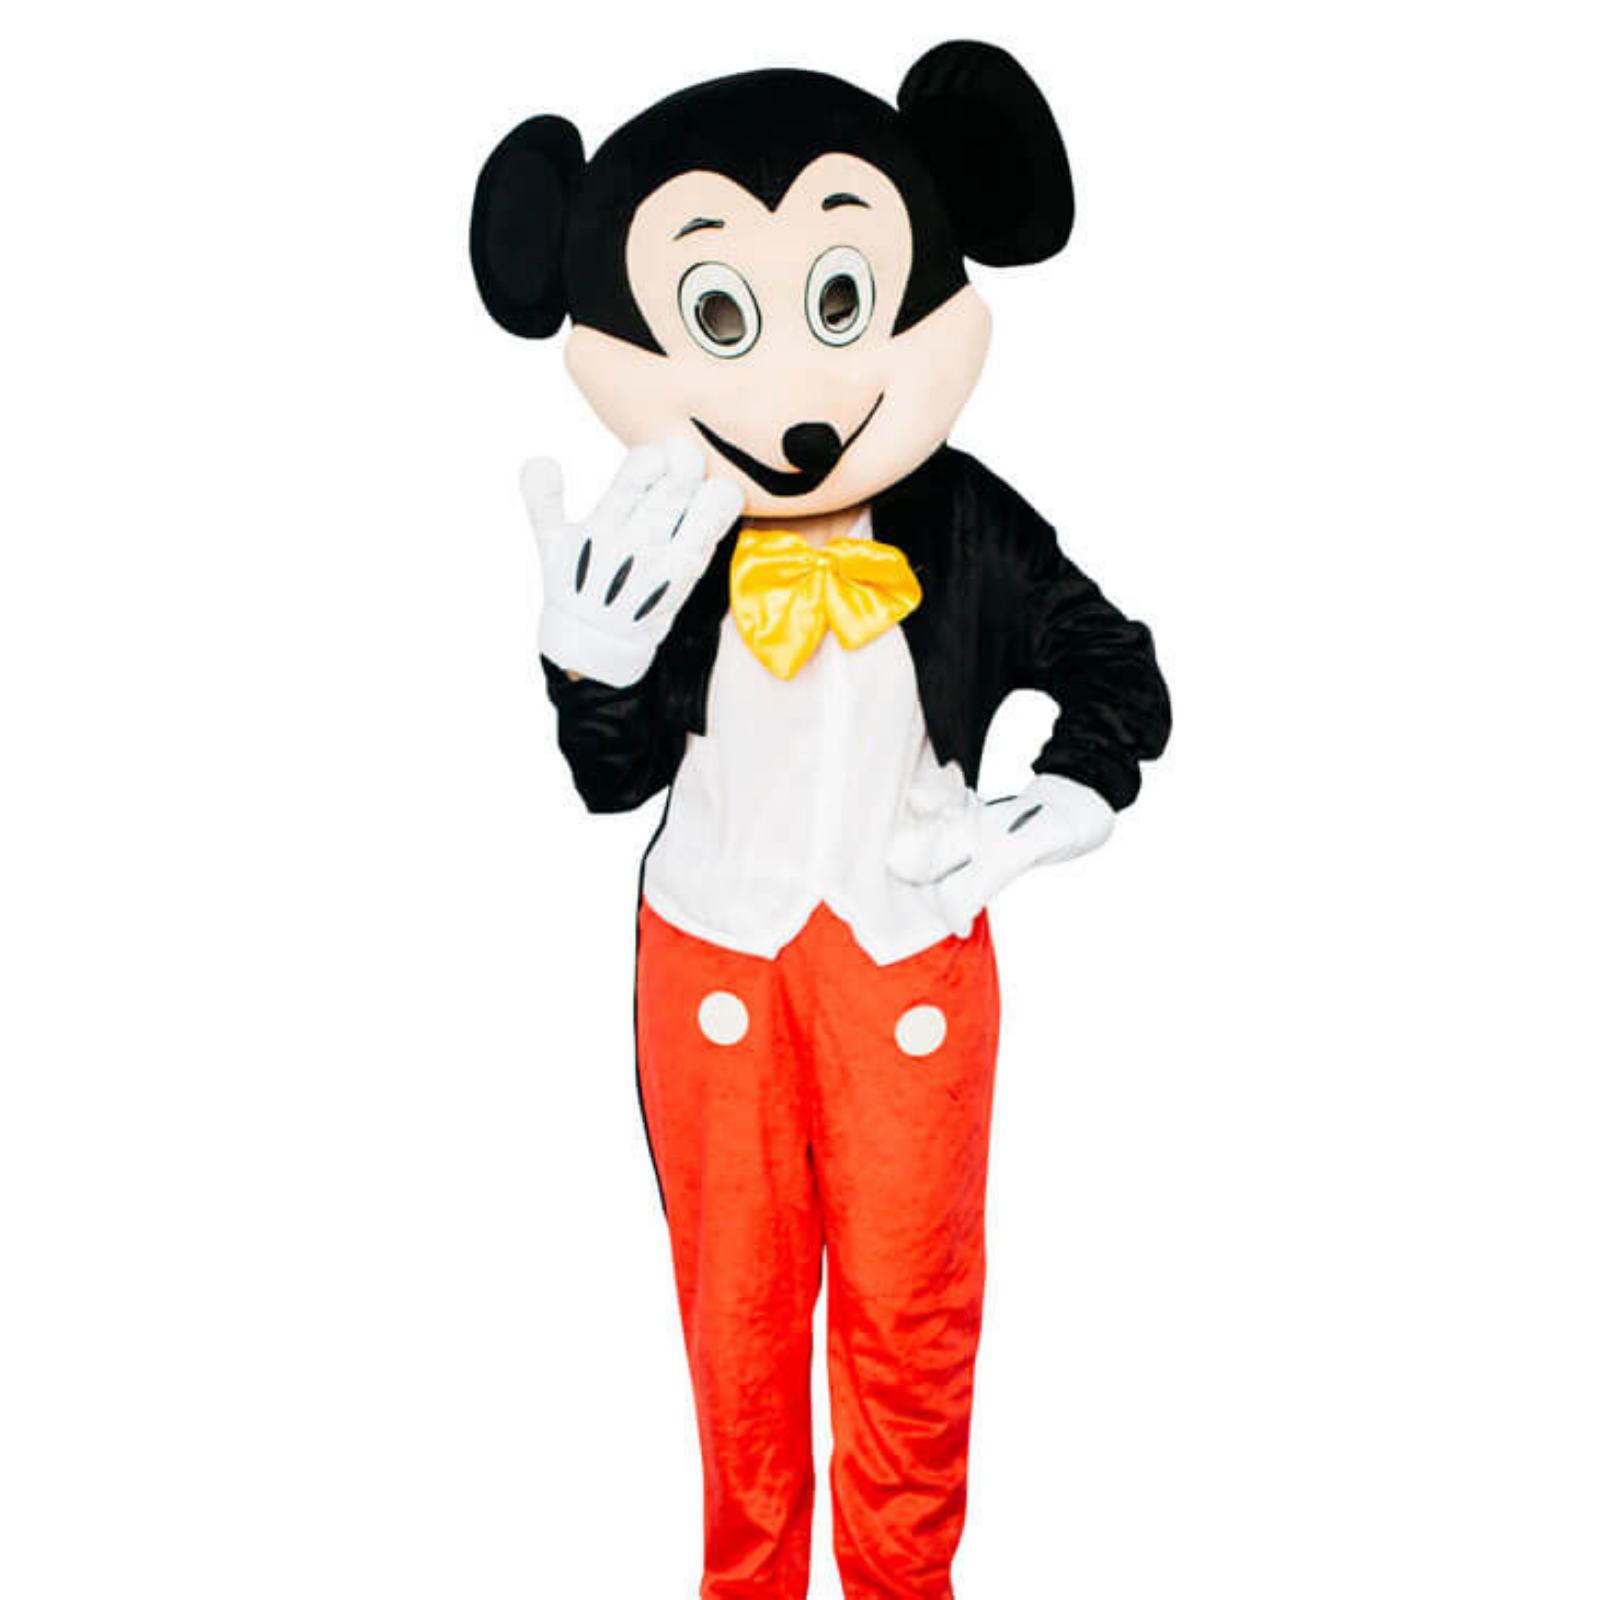 Mickey Mouse Mascot